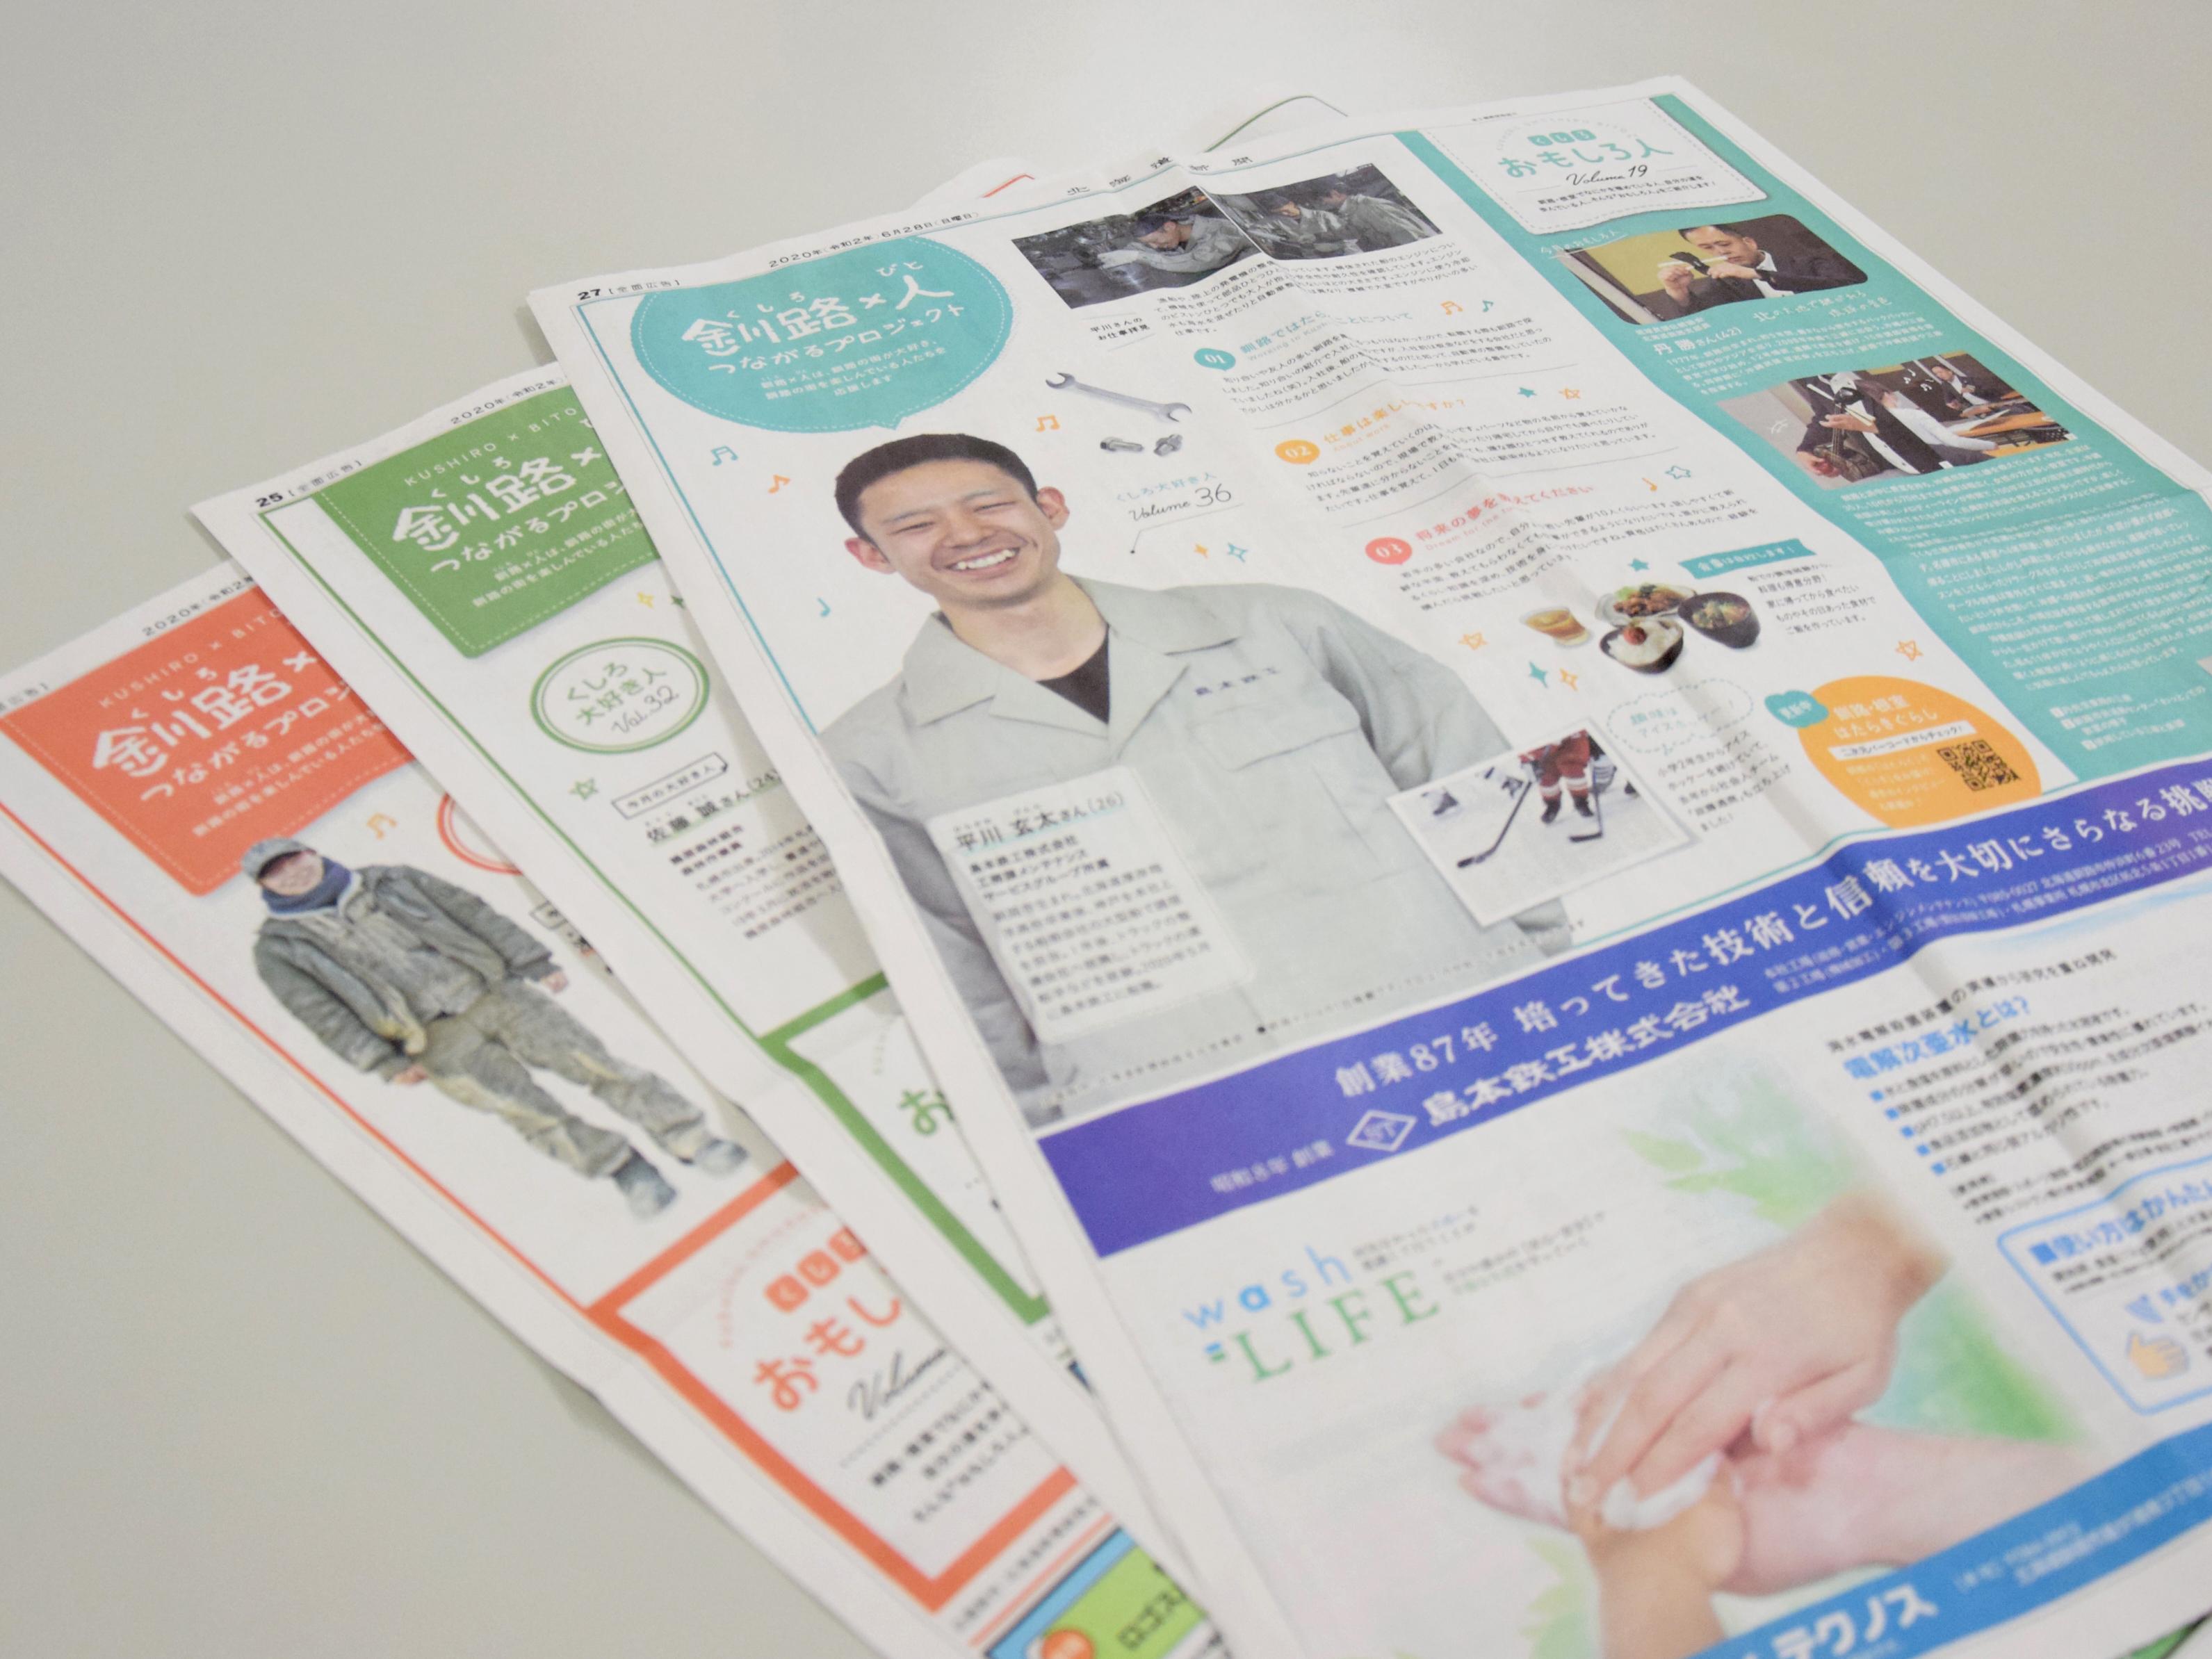 <span>Magazine</span><br>北海道新聞<br>インタビュー記事 釧路×人